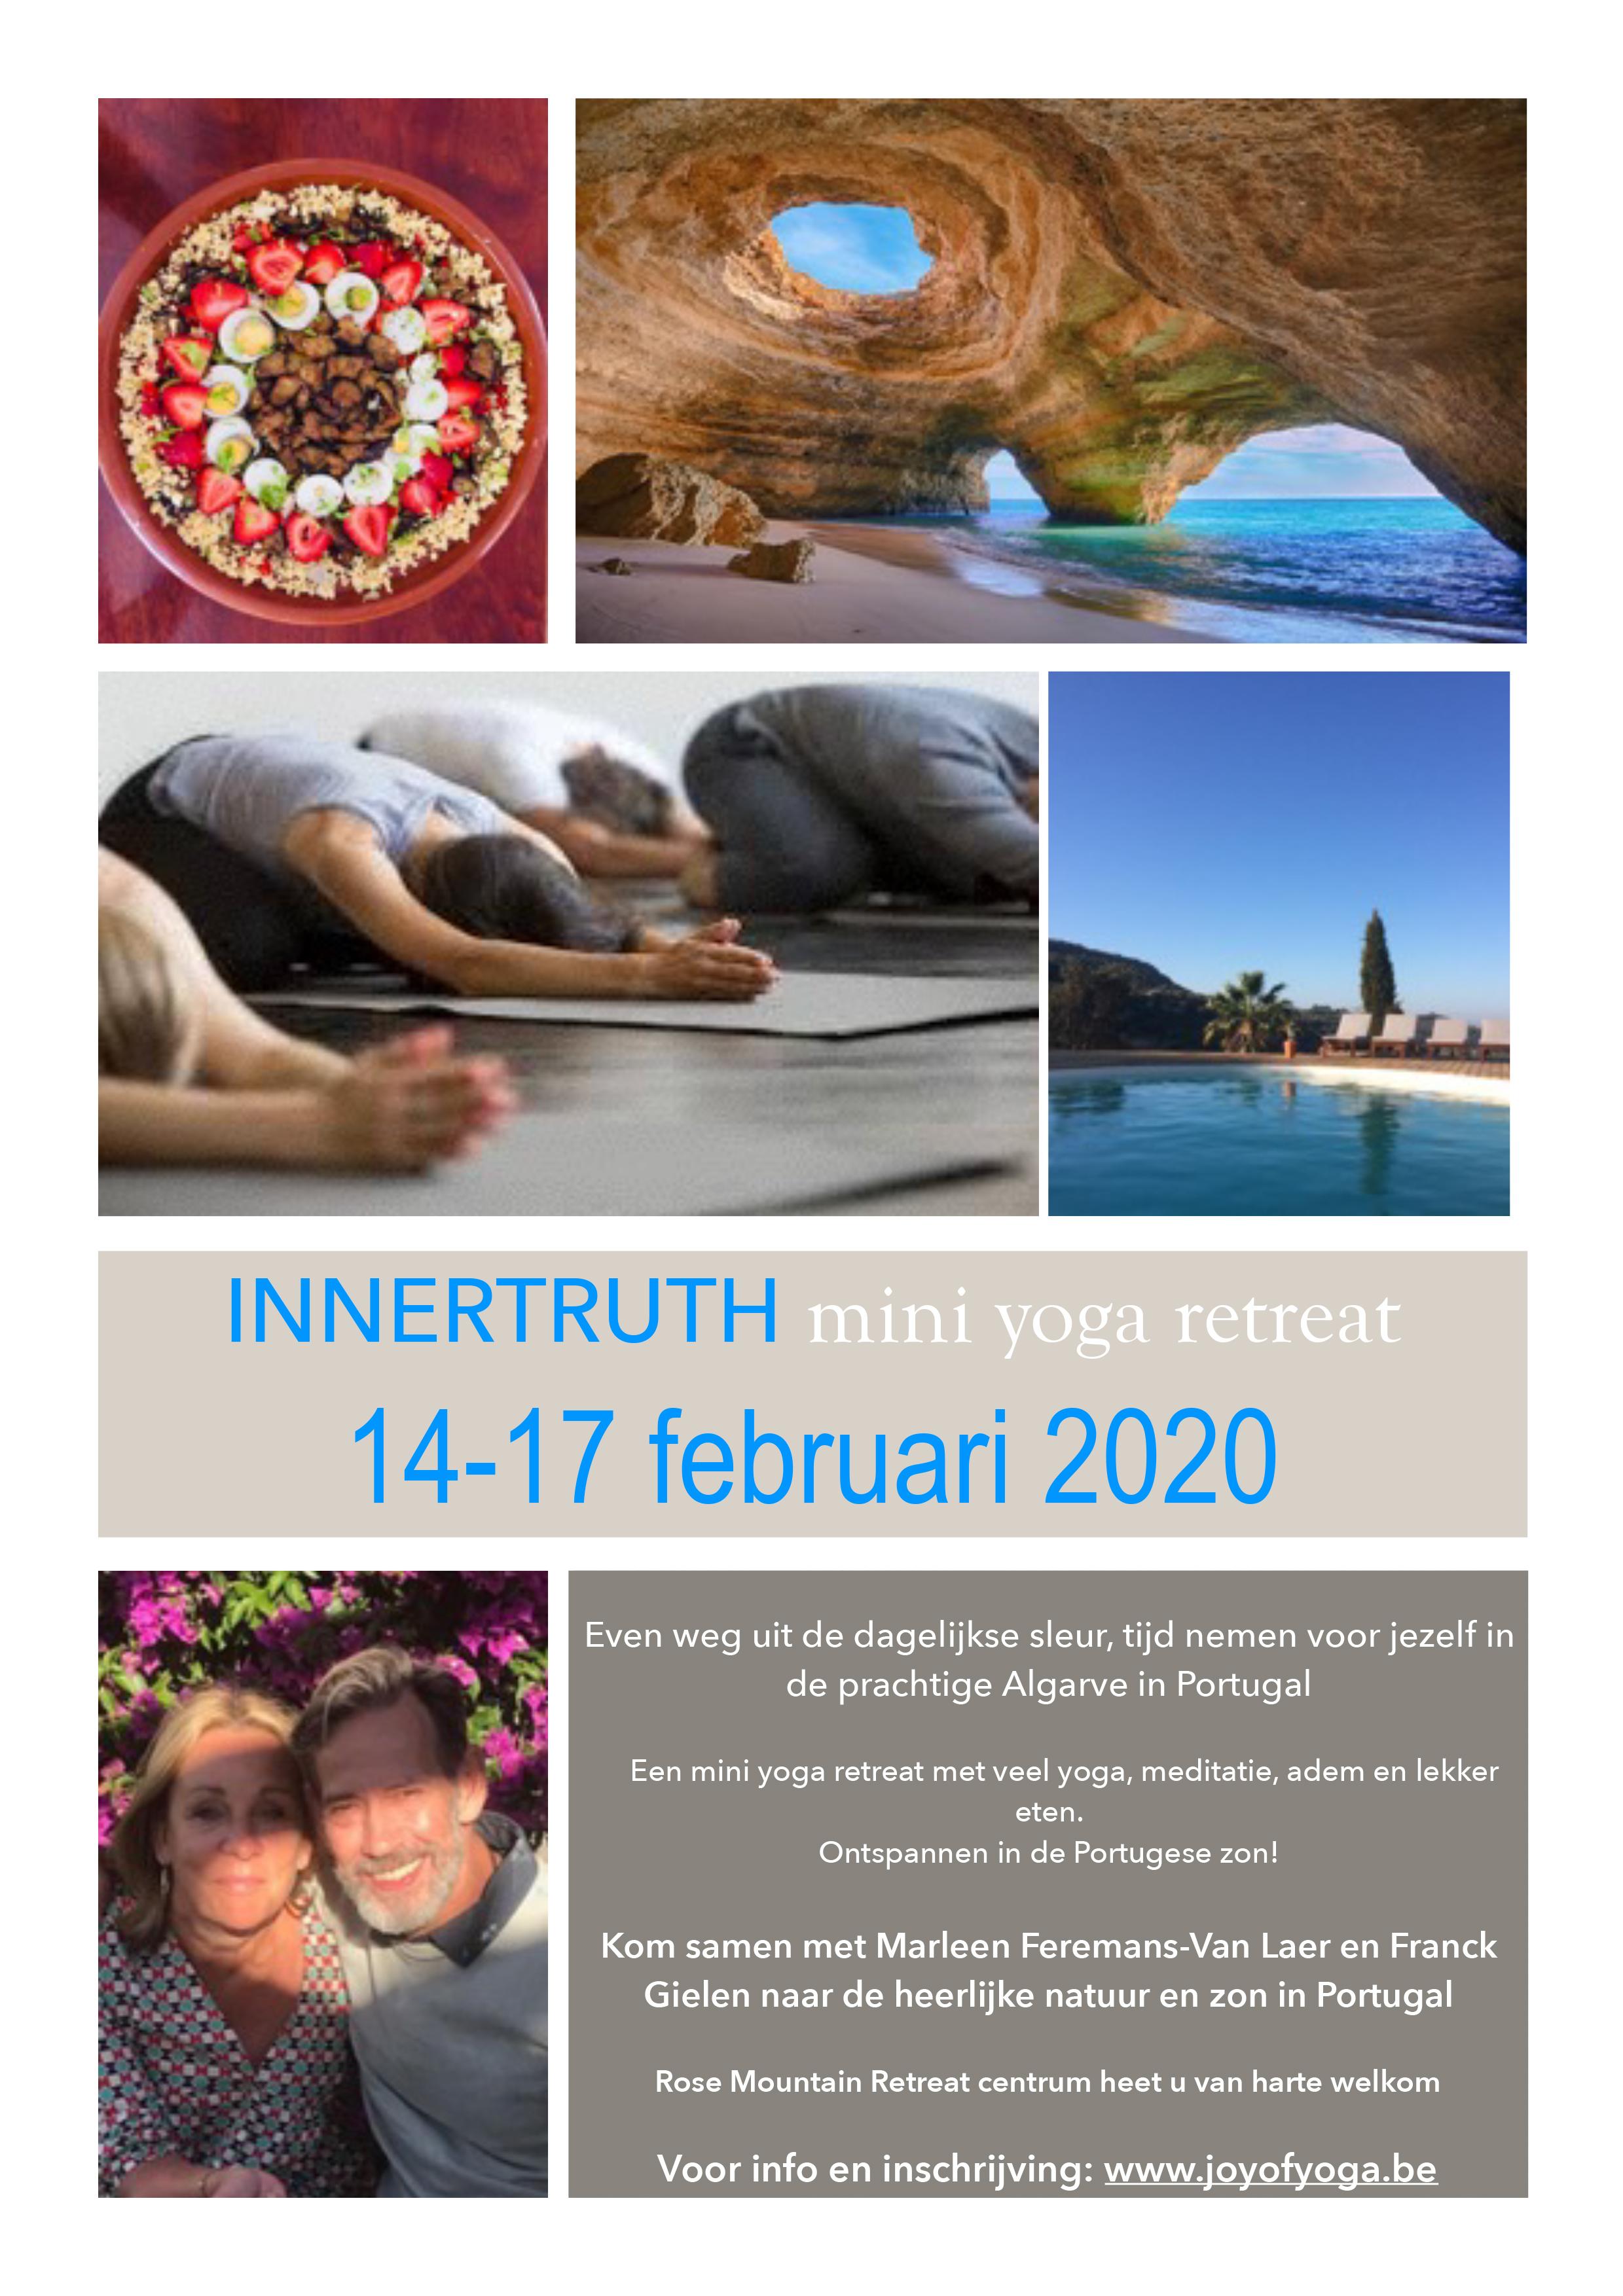 yoga retreat innertruth 2020.jpg